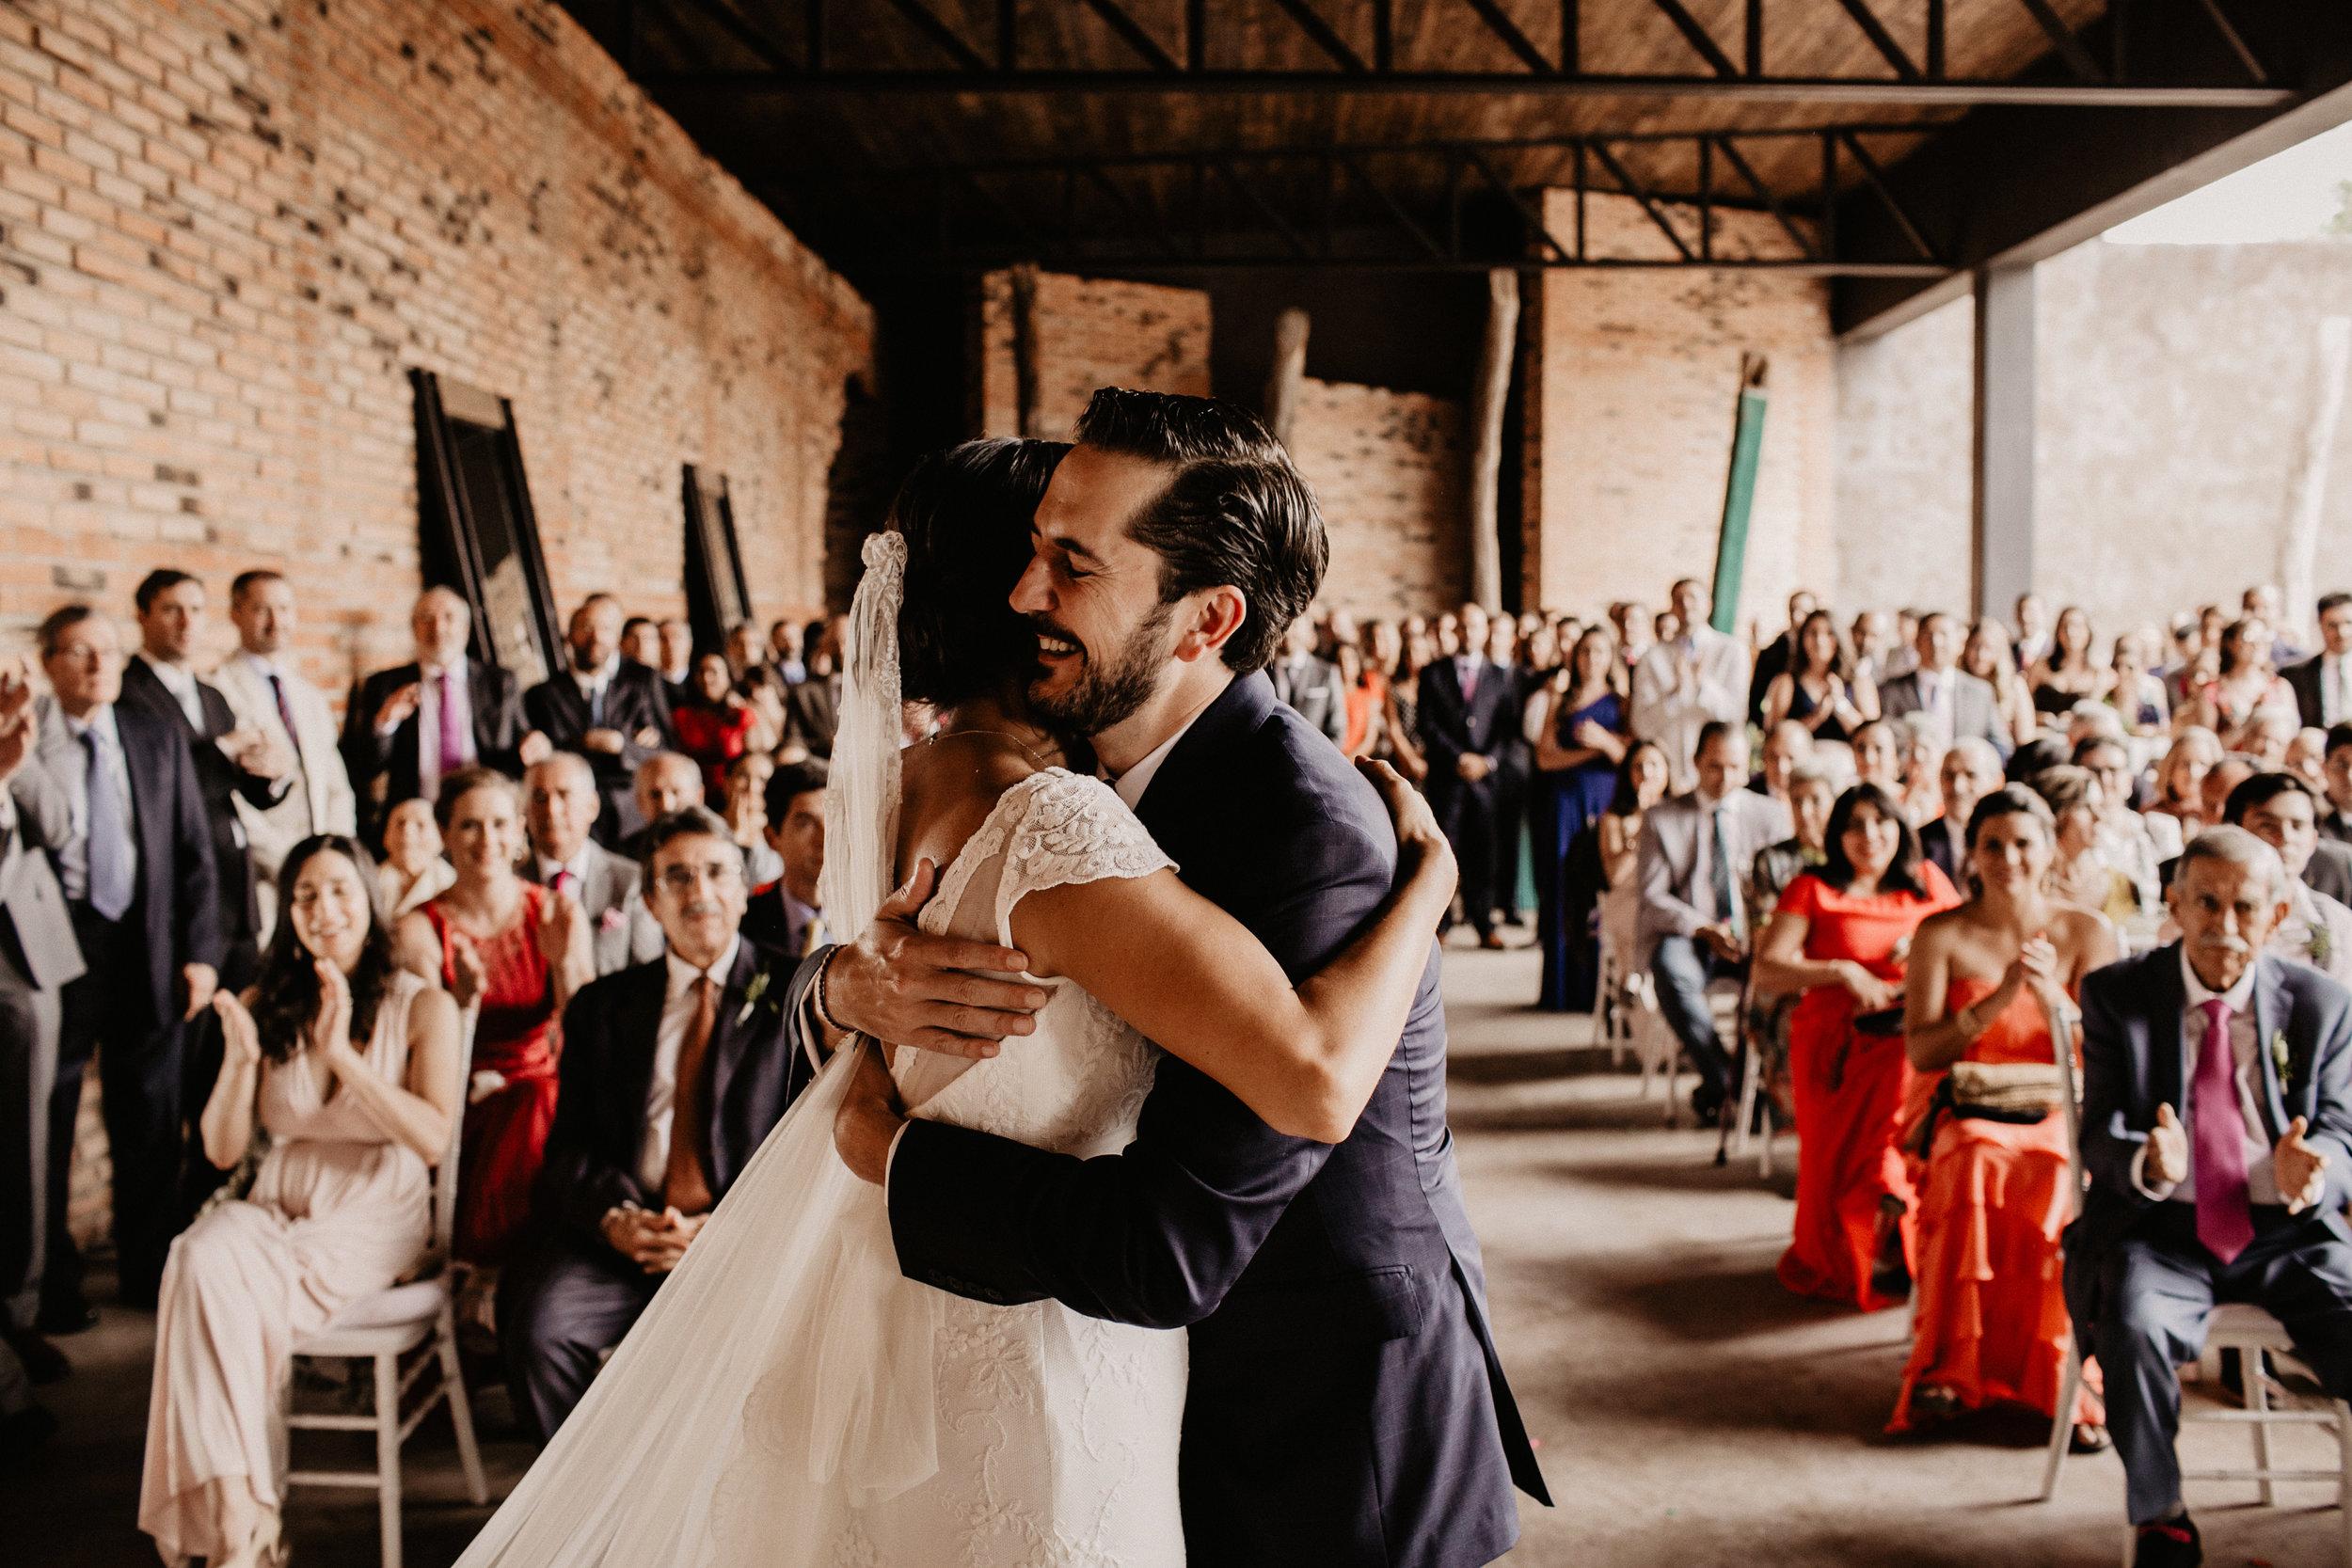 alfonso_flores_destination_wedding_photographer_pau_alonso_657.JPG